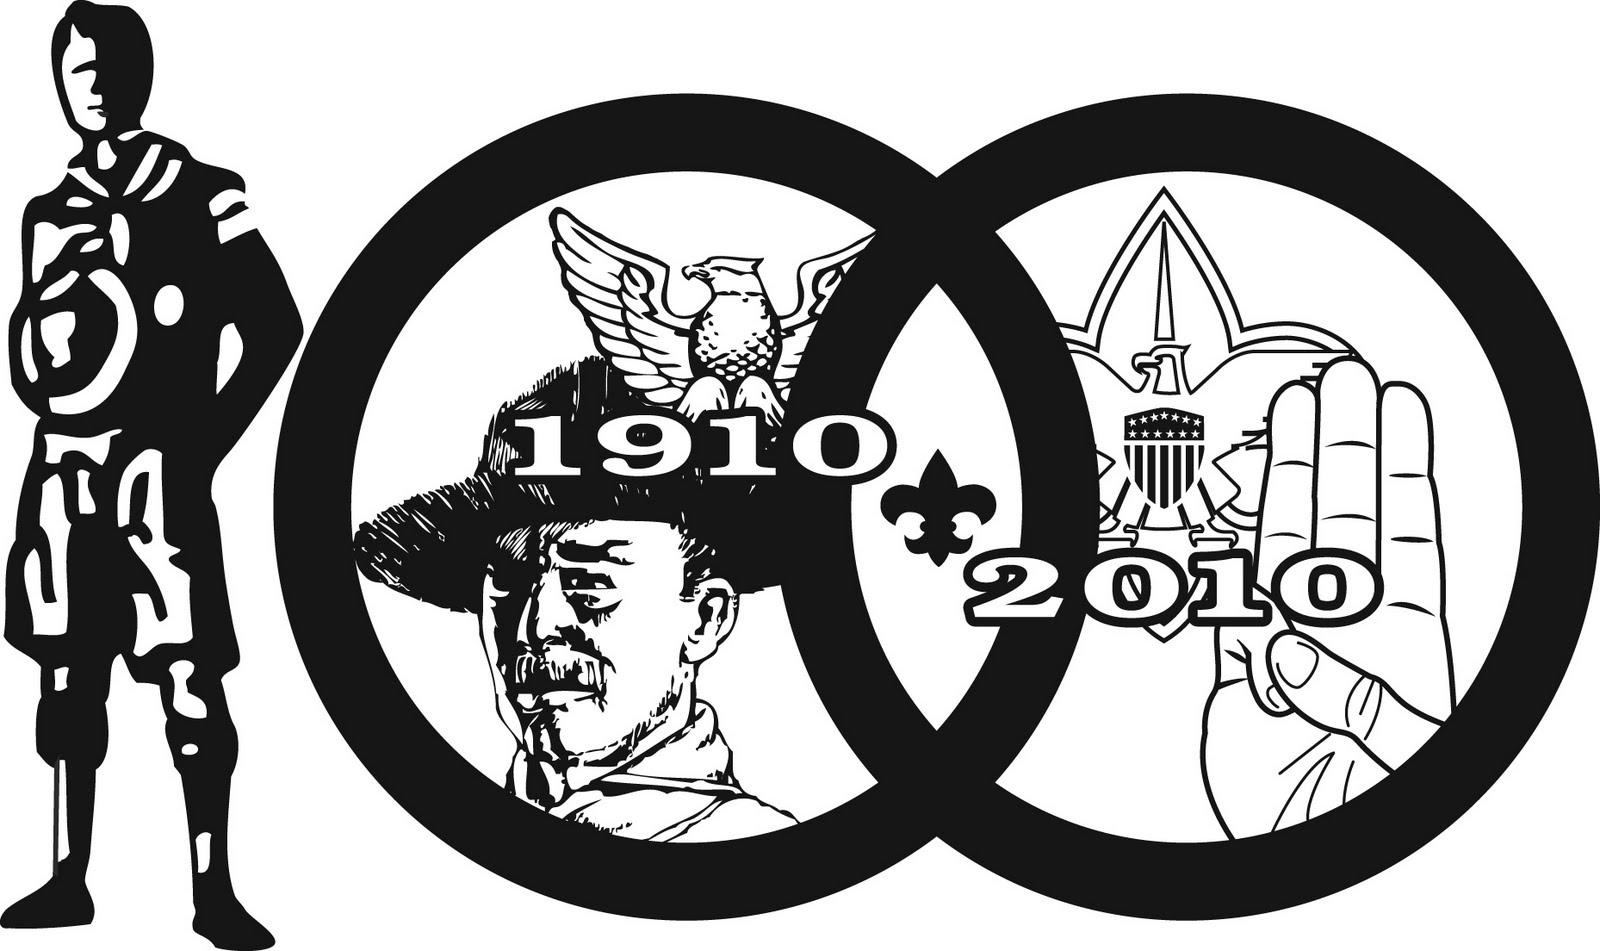 [100_years_scouts.sflb.jpg]